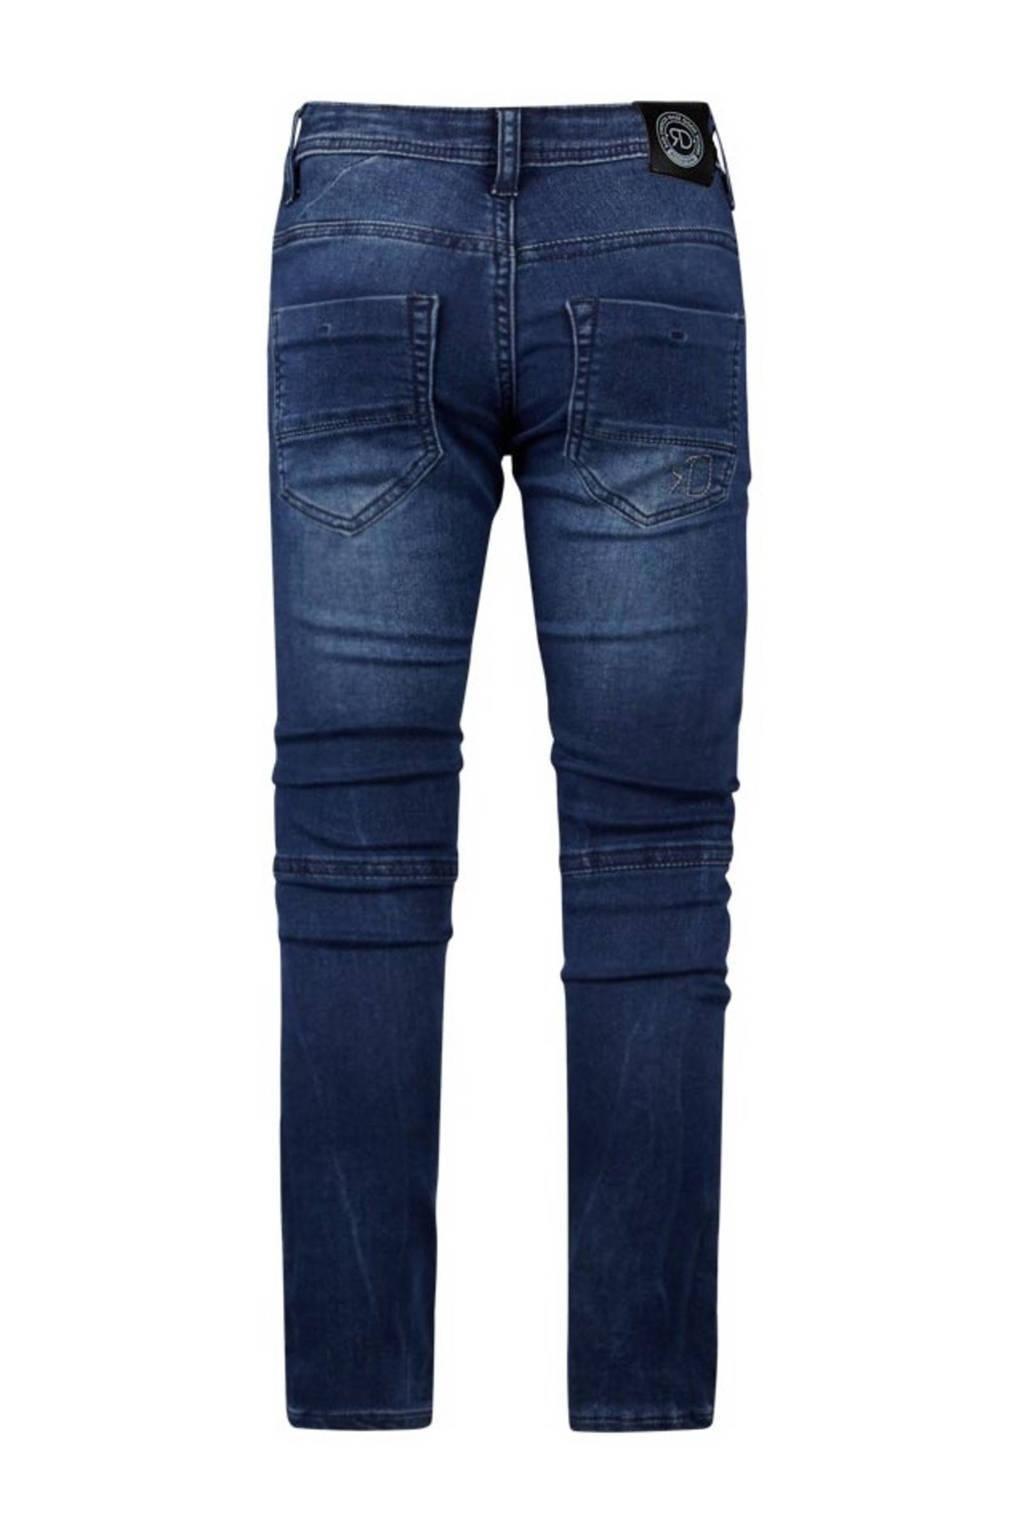 Retour Denim tapered fit jeans Yves medium blue denim, Medium blue denim